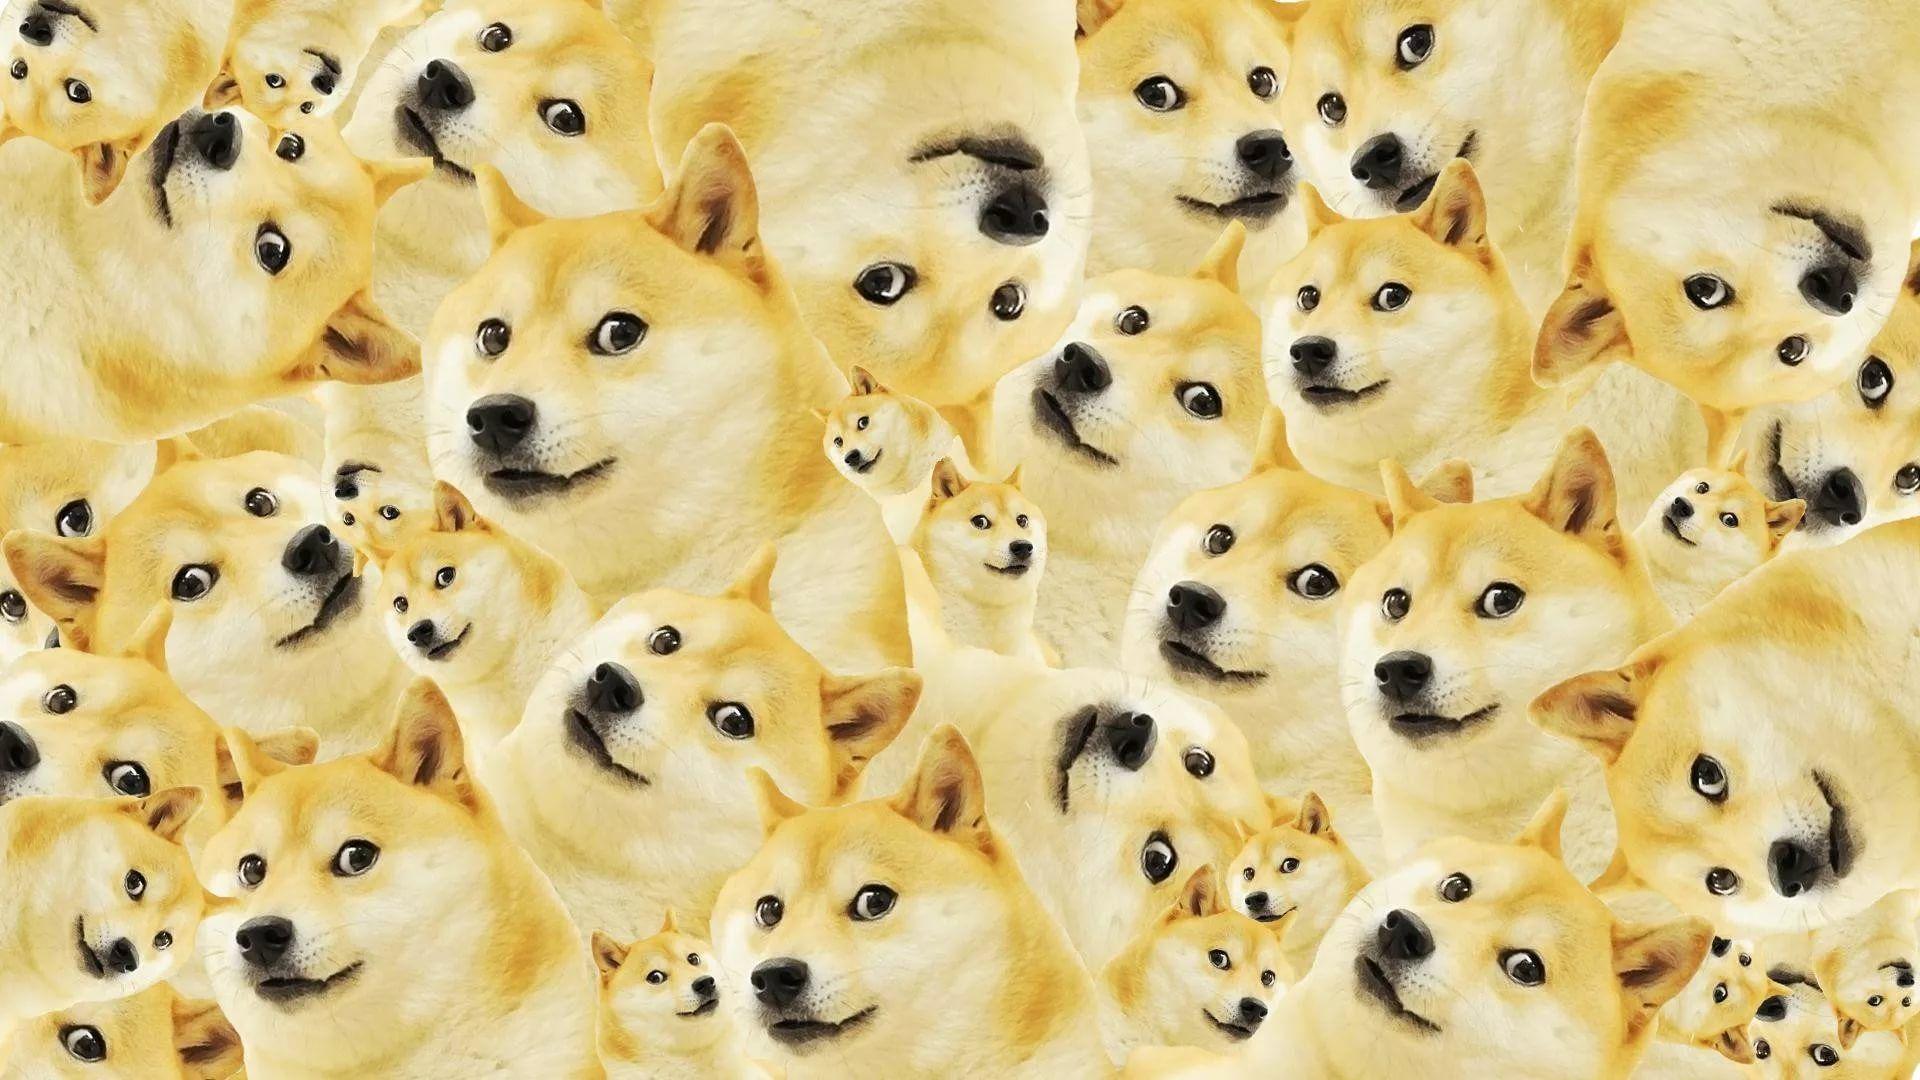 Meme download wallpaper image